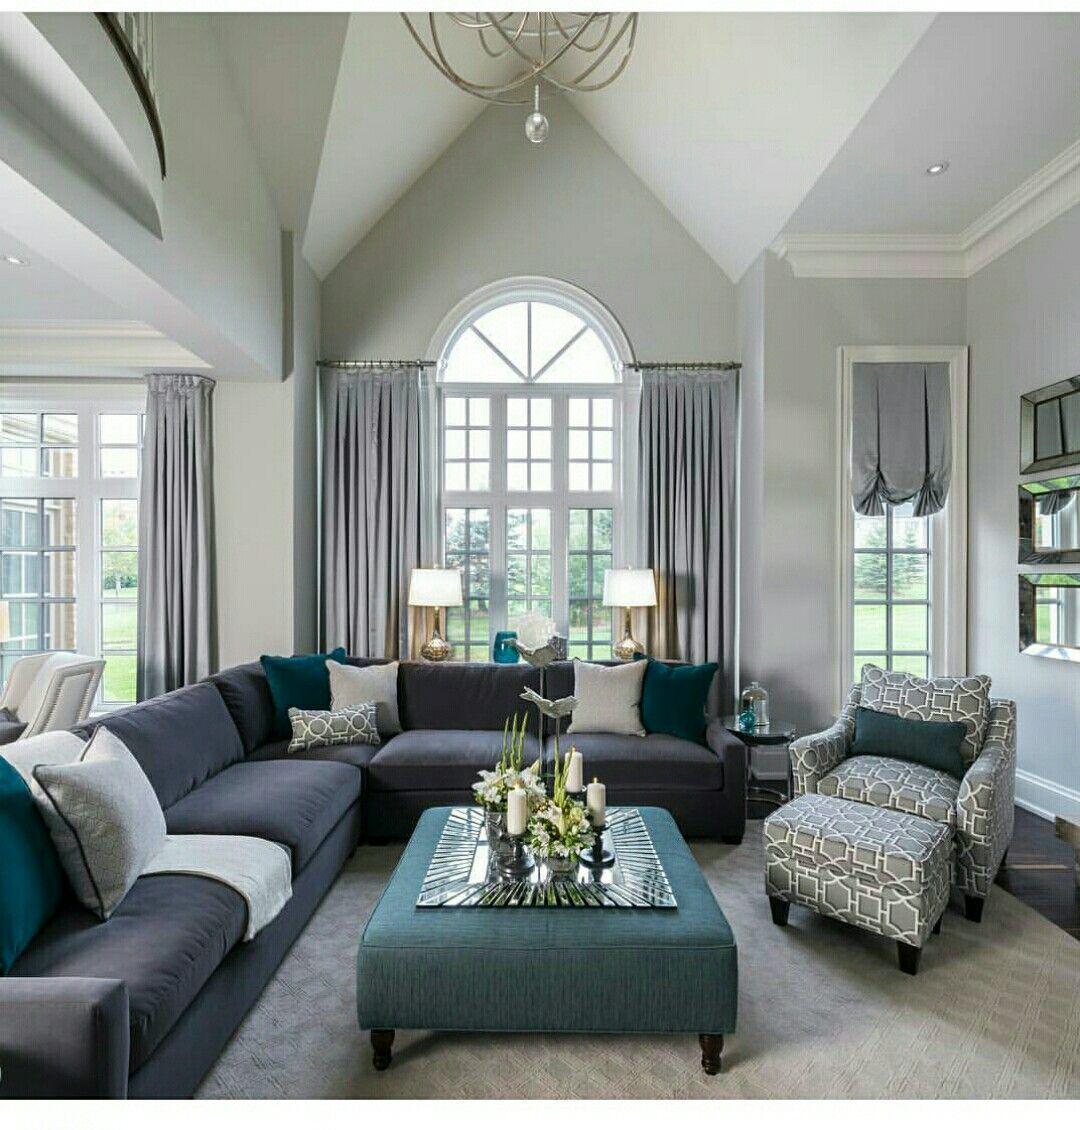 living room furniture budget%0A Window treatment ideas